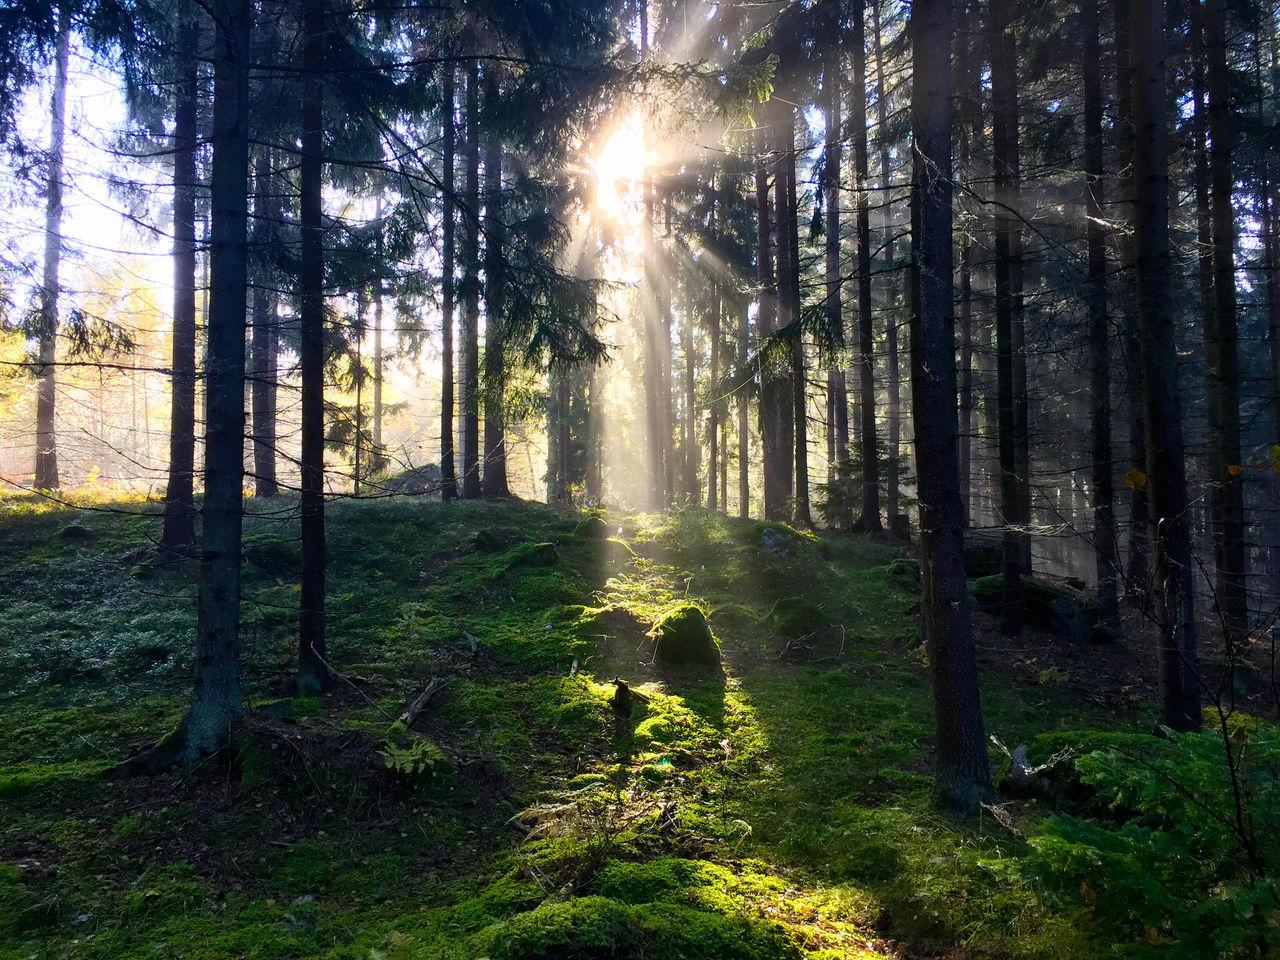 Idyllic Shot Of Sunlight In Forest